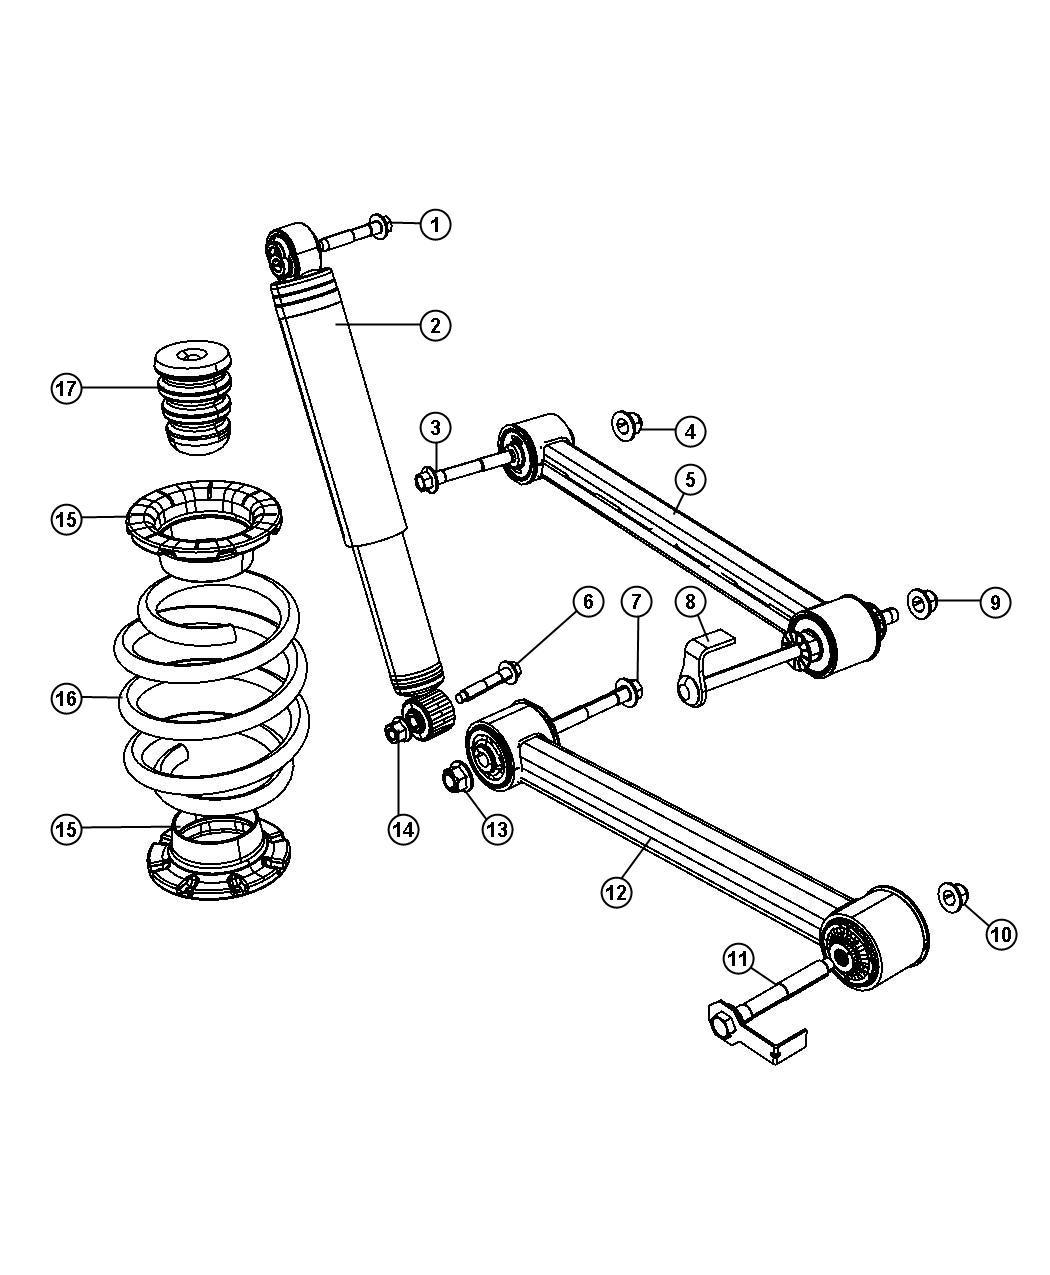 Dodge NITRO Arm. Lower control. Rear. Suspension, bushings